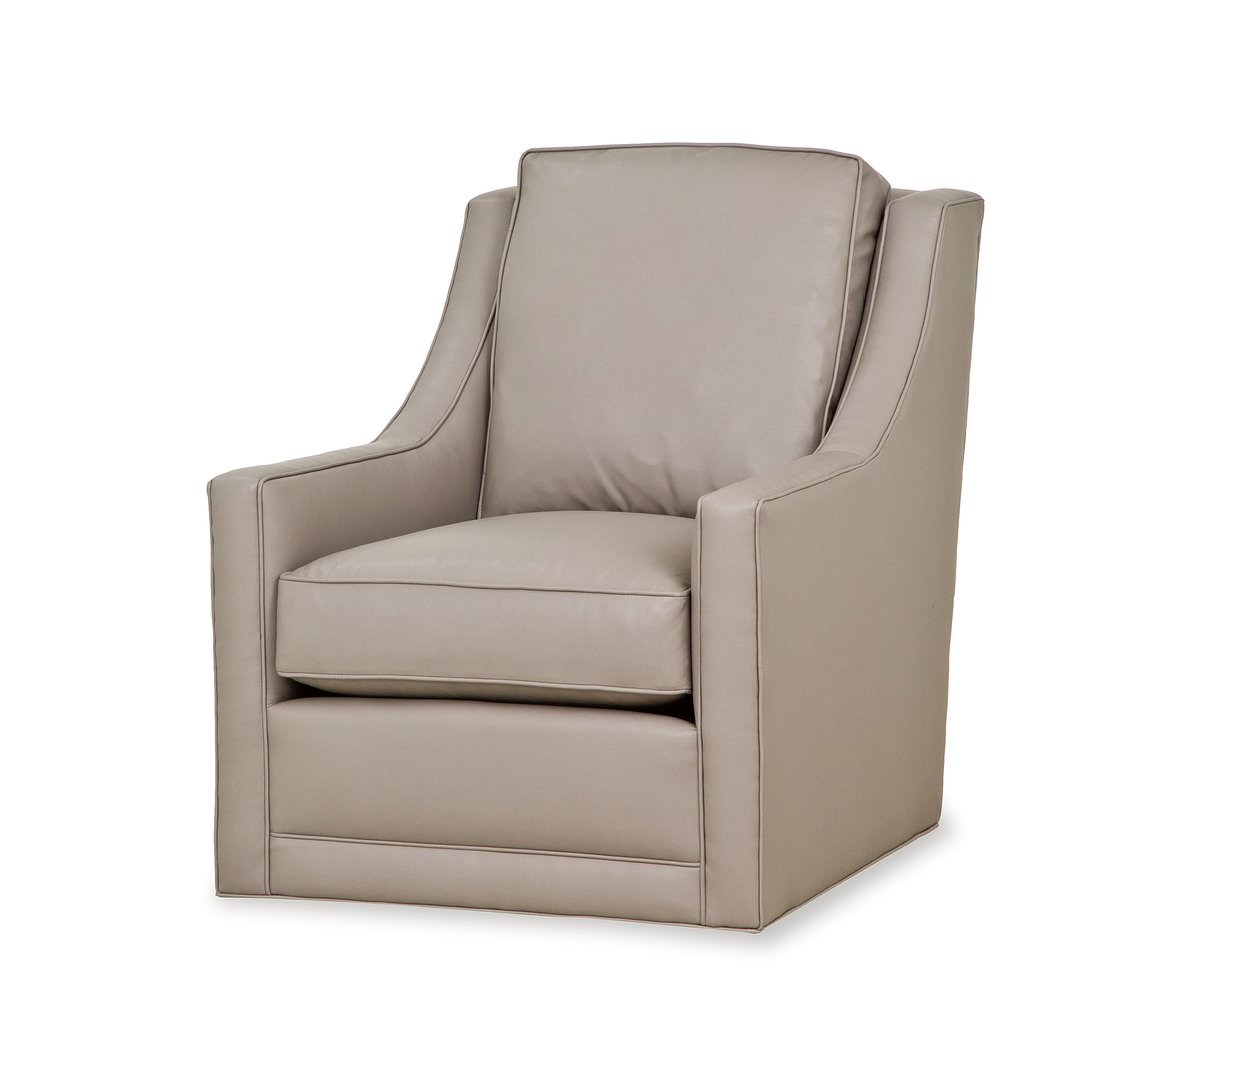 Redding Swivel Chair Image